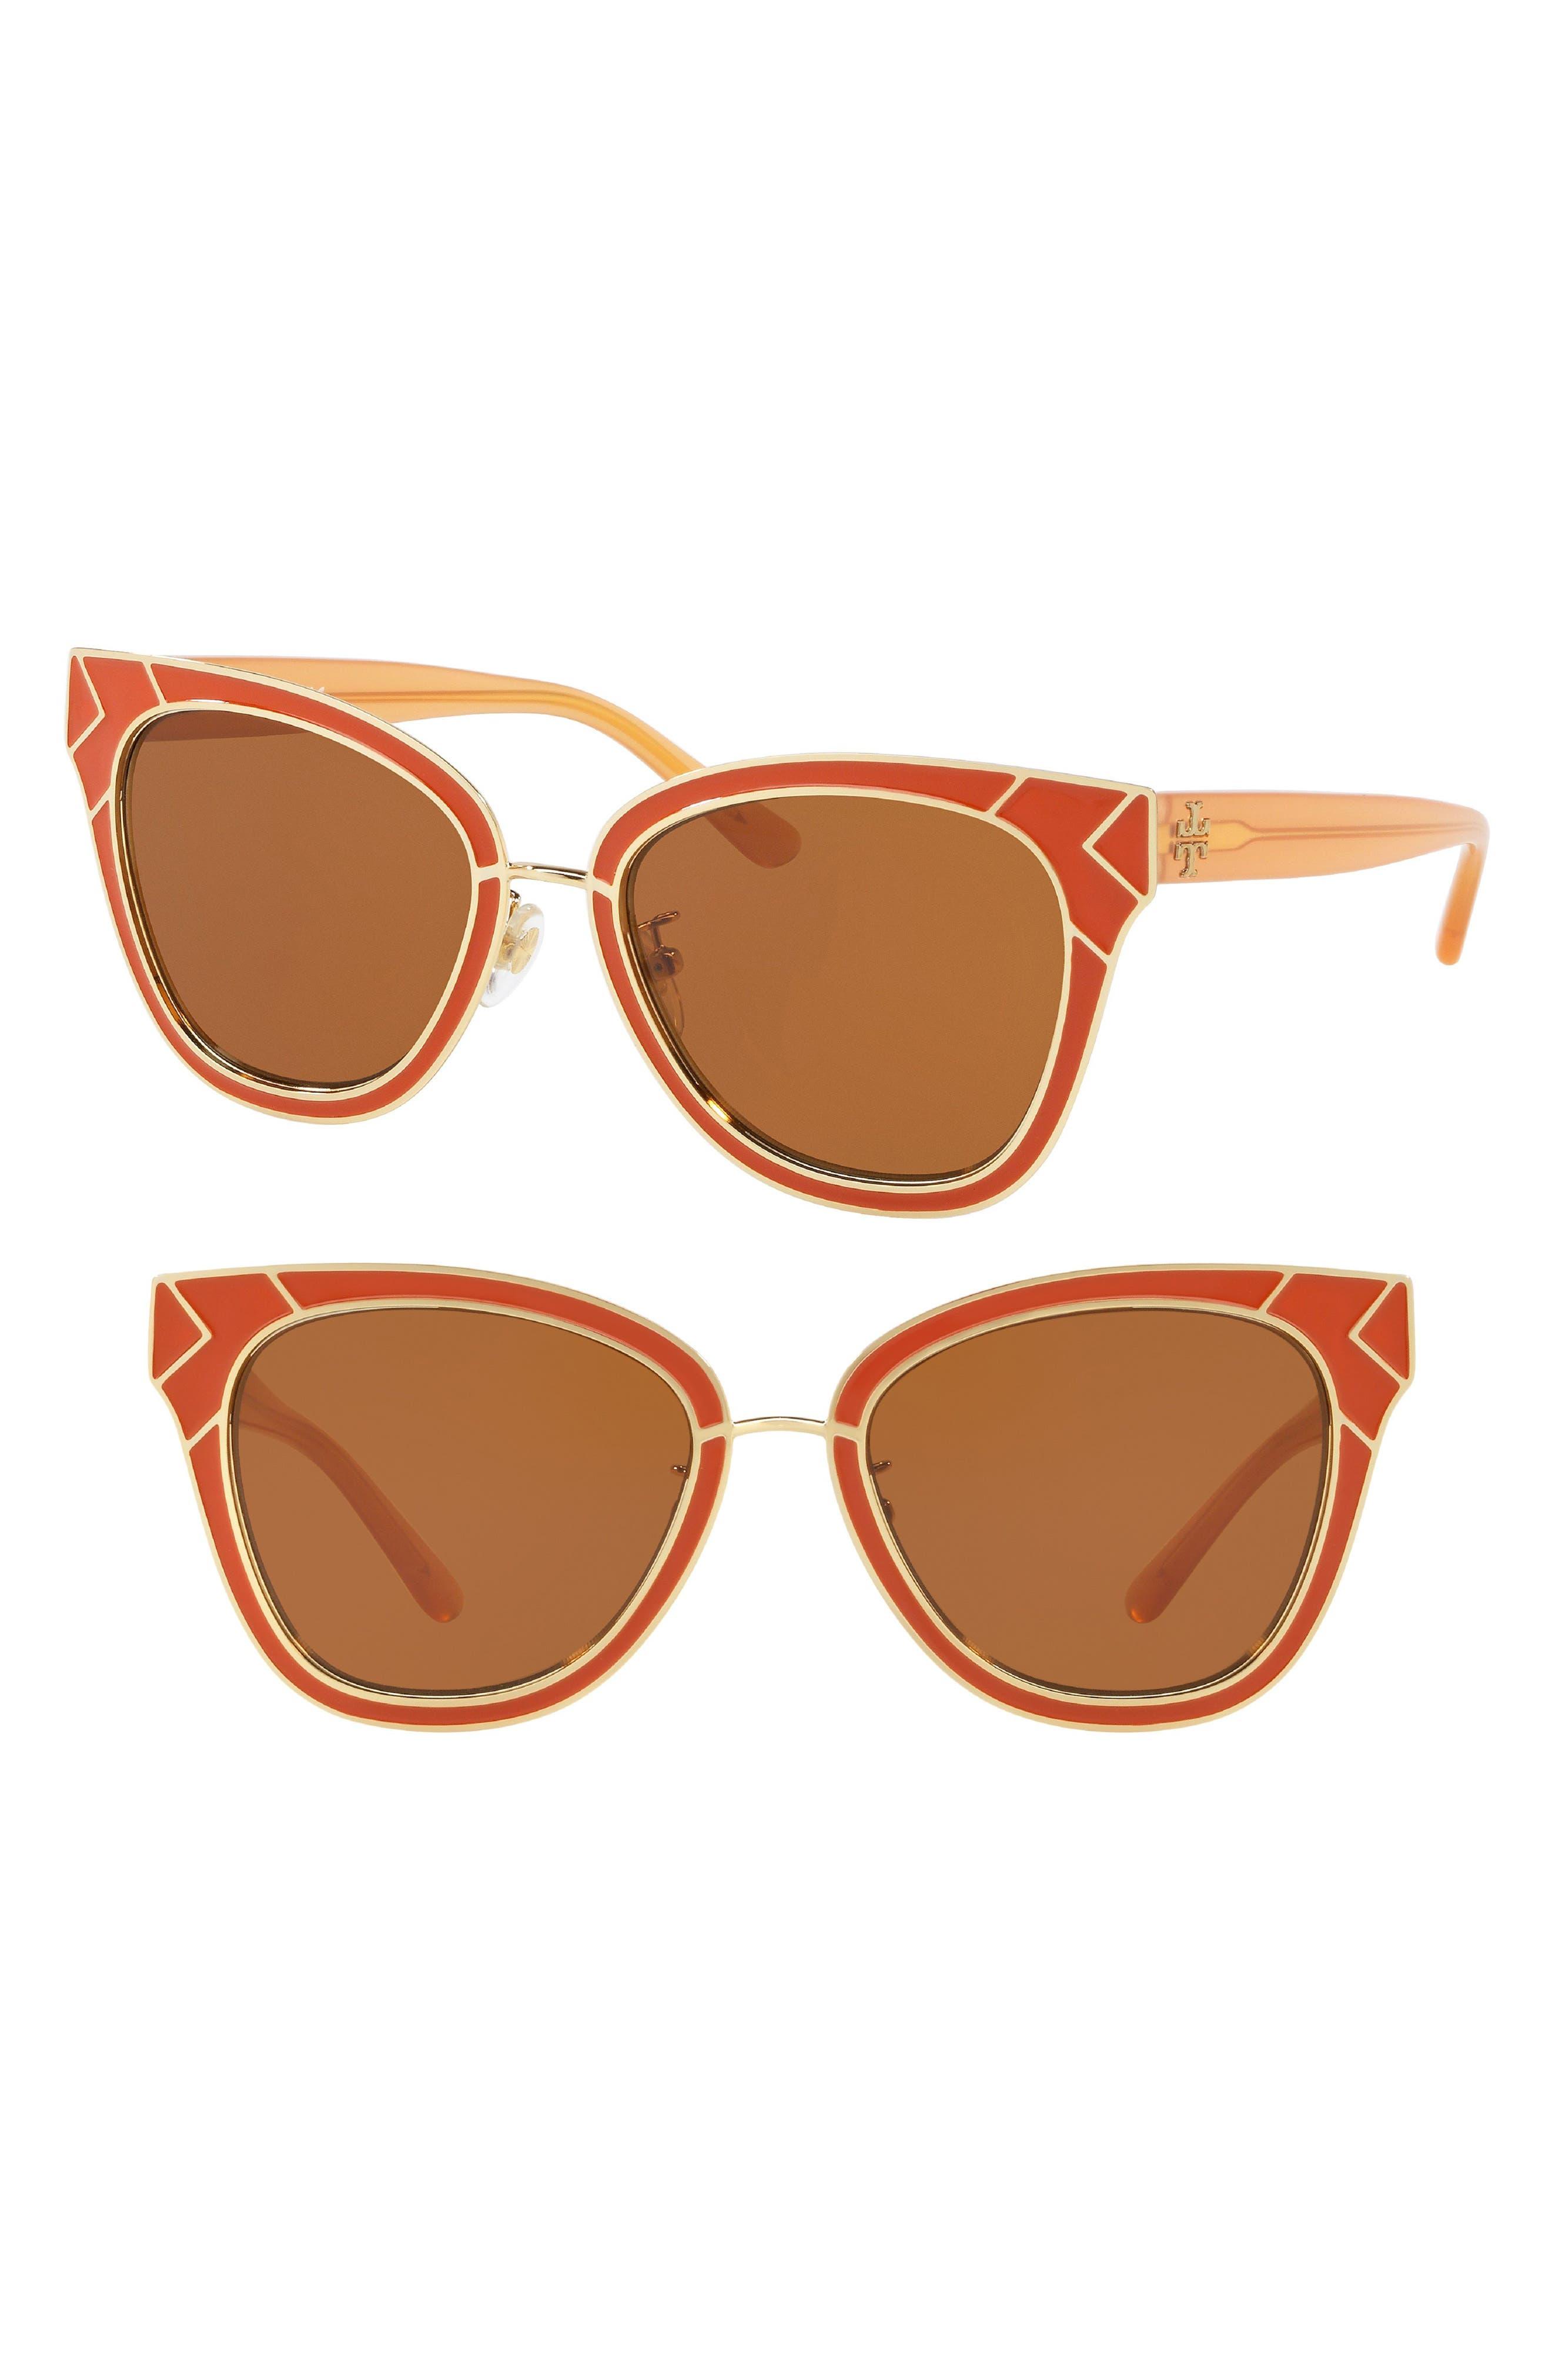 Enamel San Ray 53mm Sunglasses,                         Main,                         color, Gold/ Orange